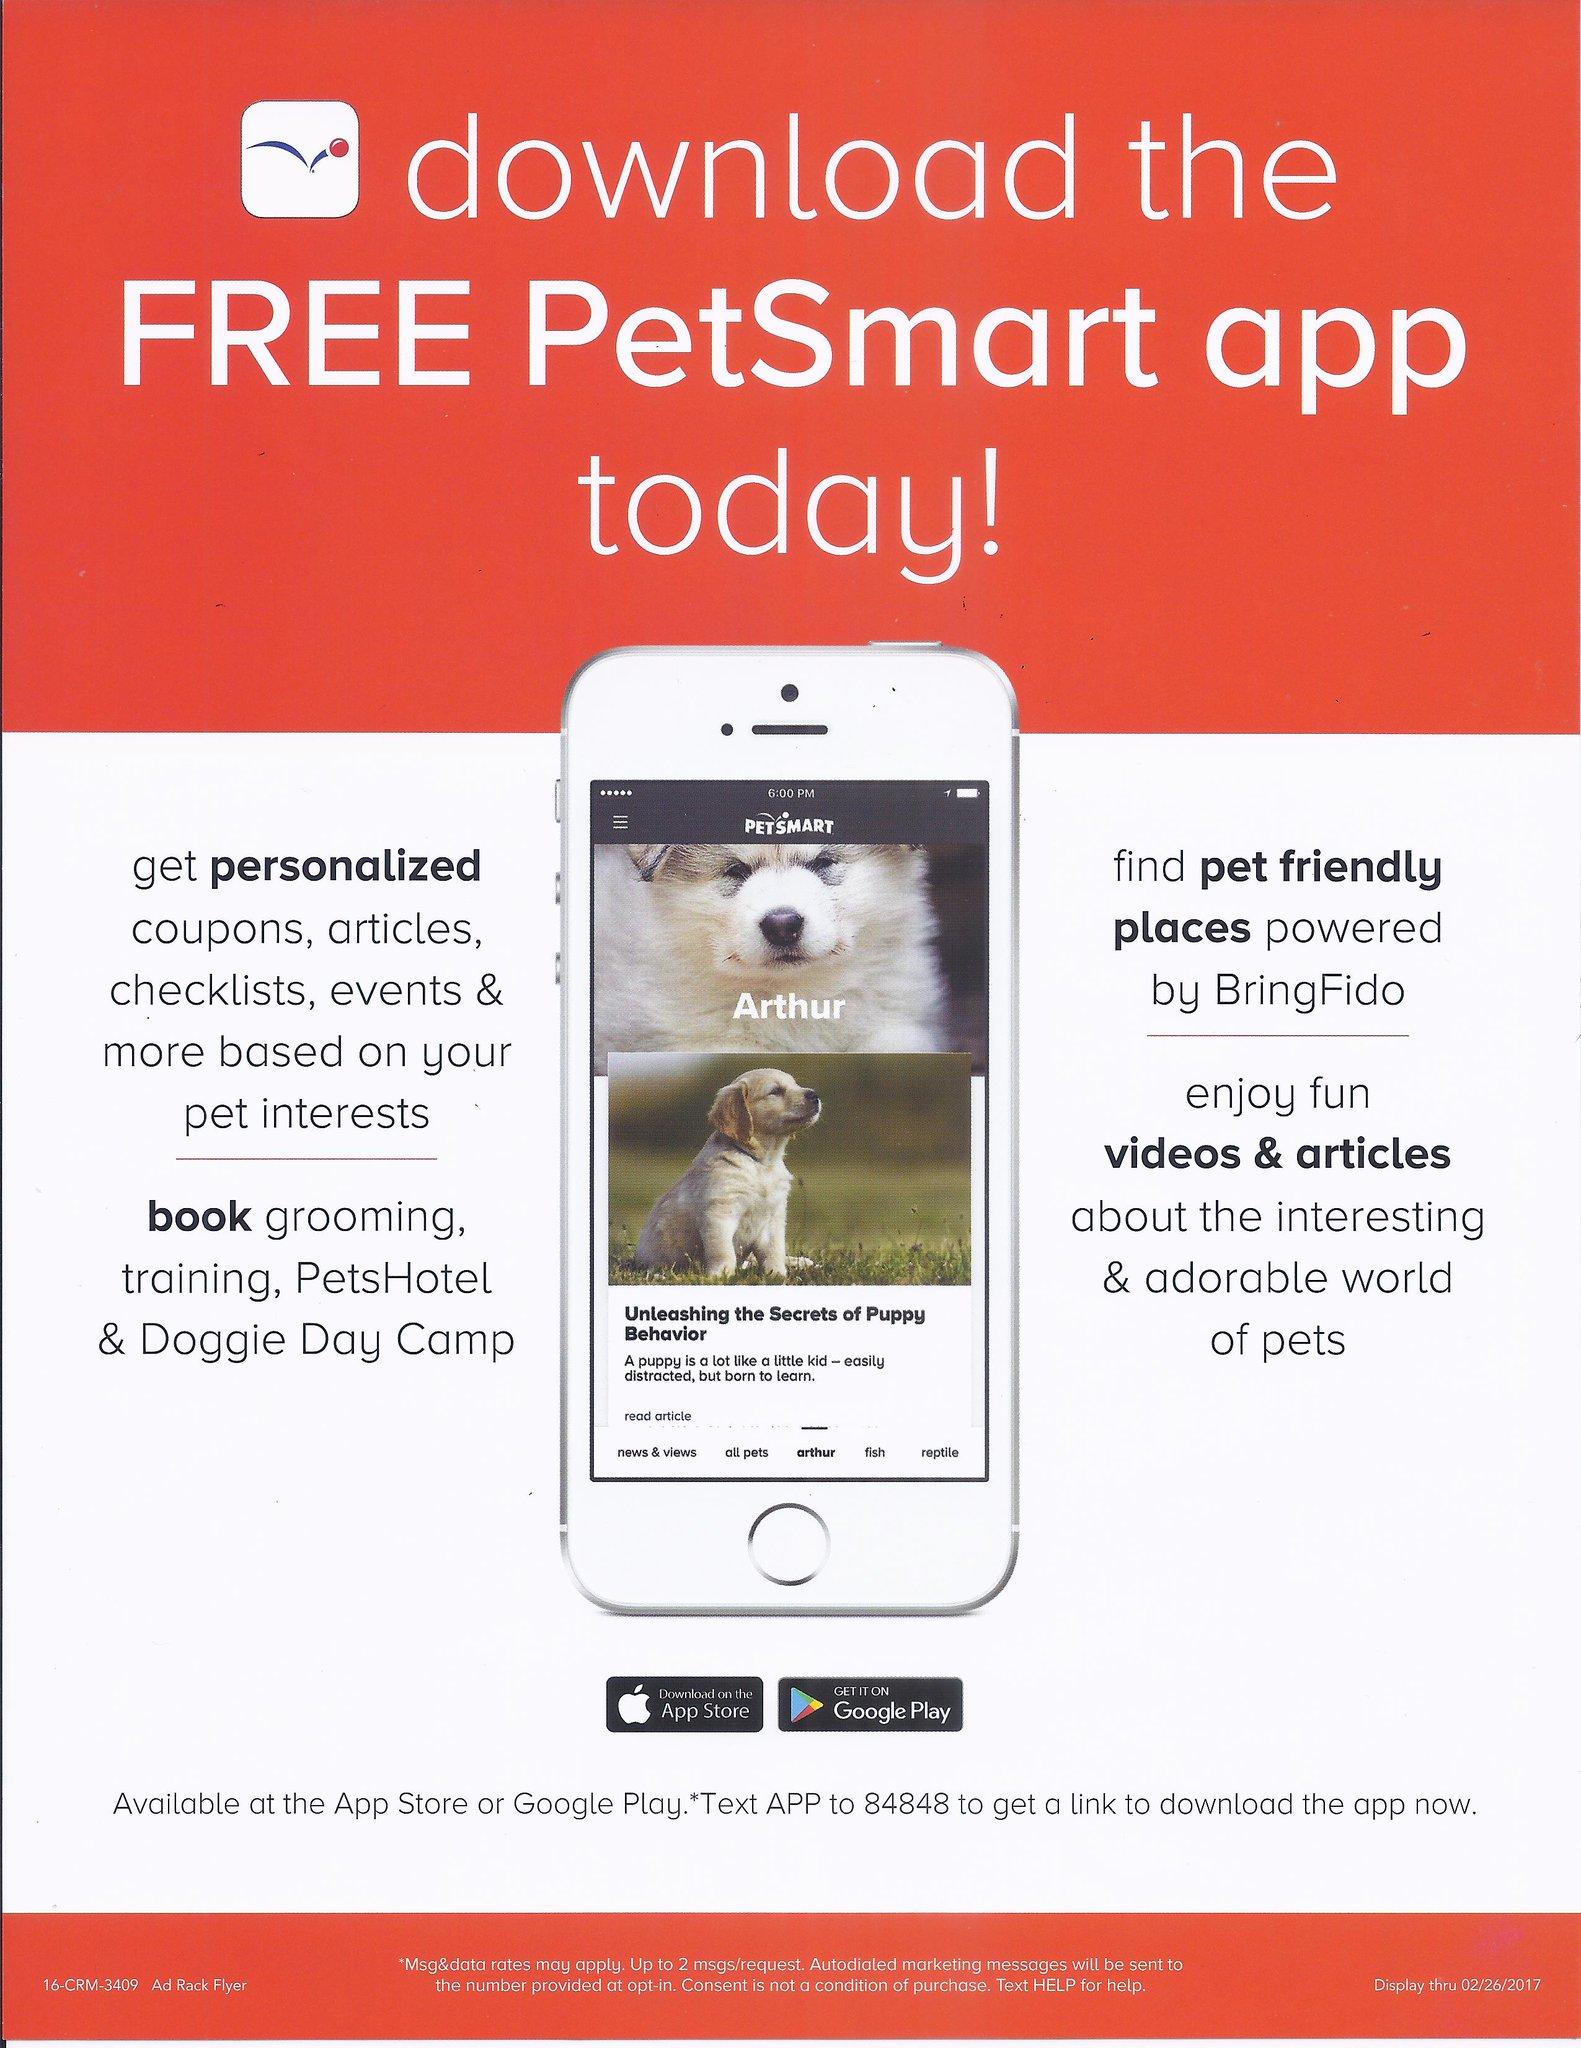 PetSmart Store 1184 on Twitter: